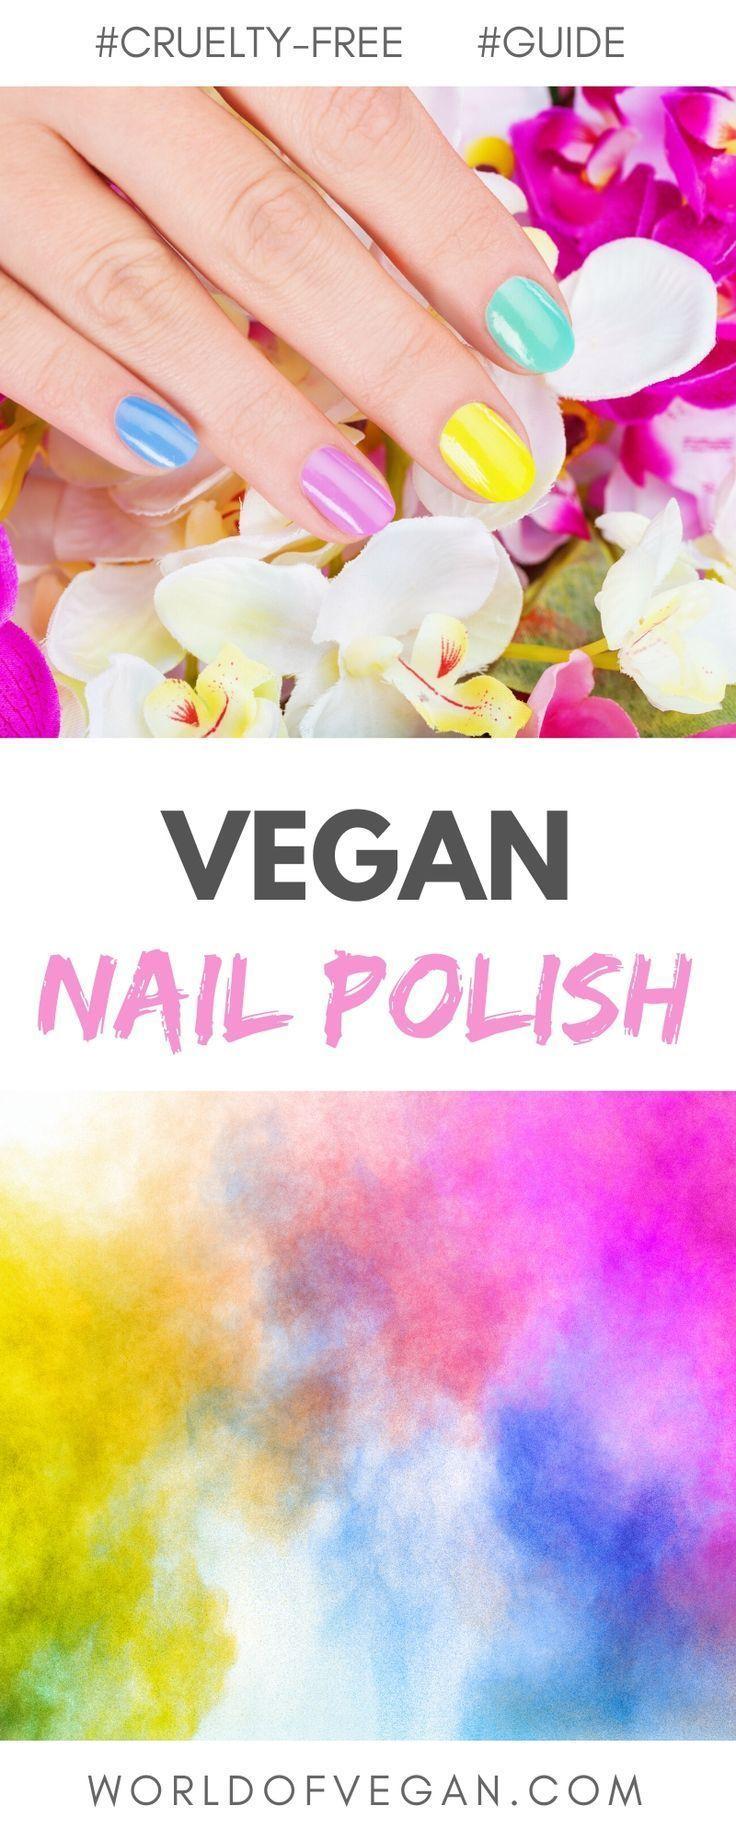 Guide to Natural, CrueltyFree & Vegan Nail Polish